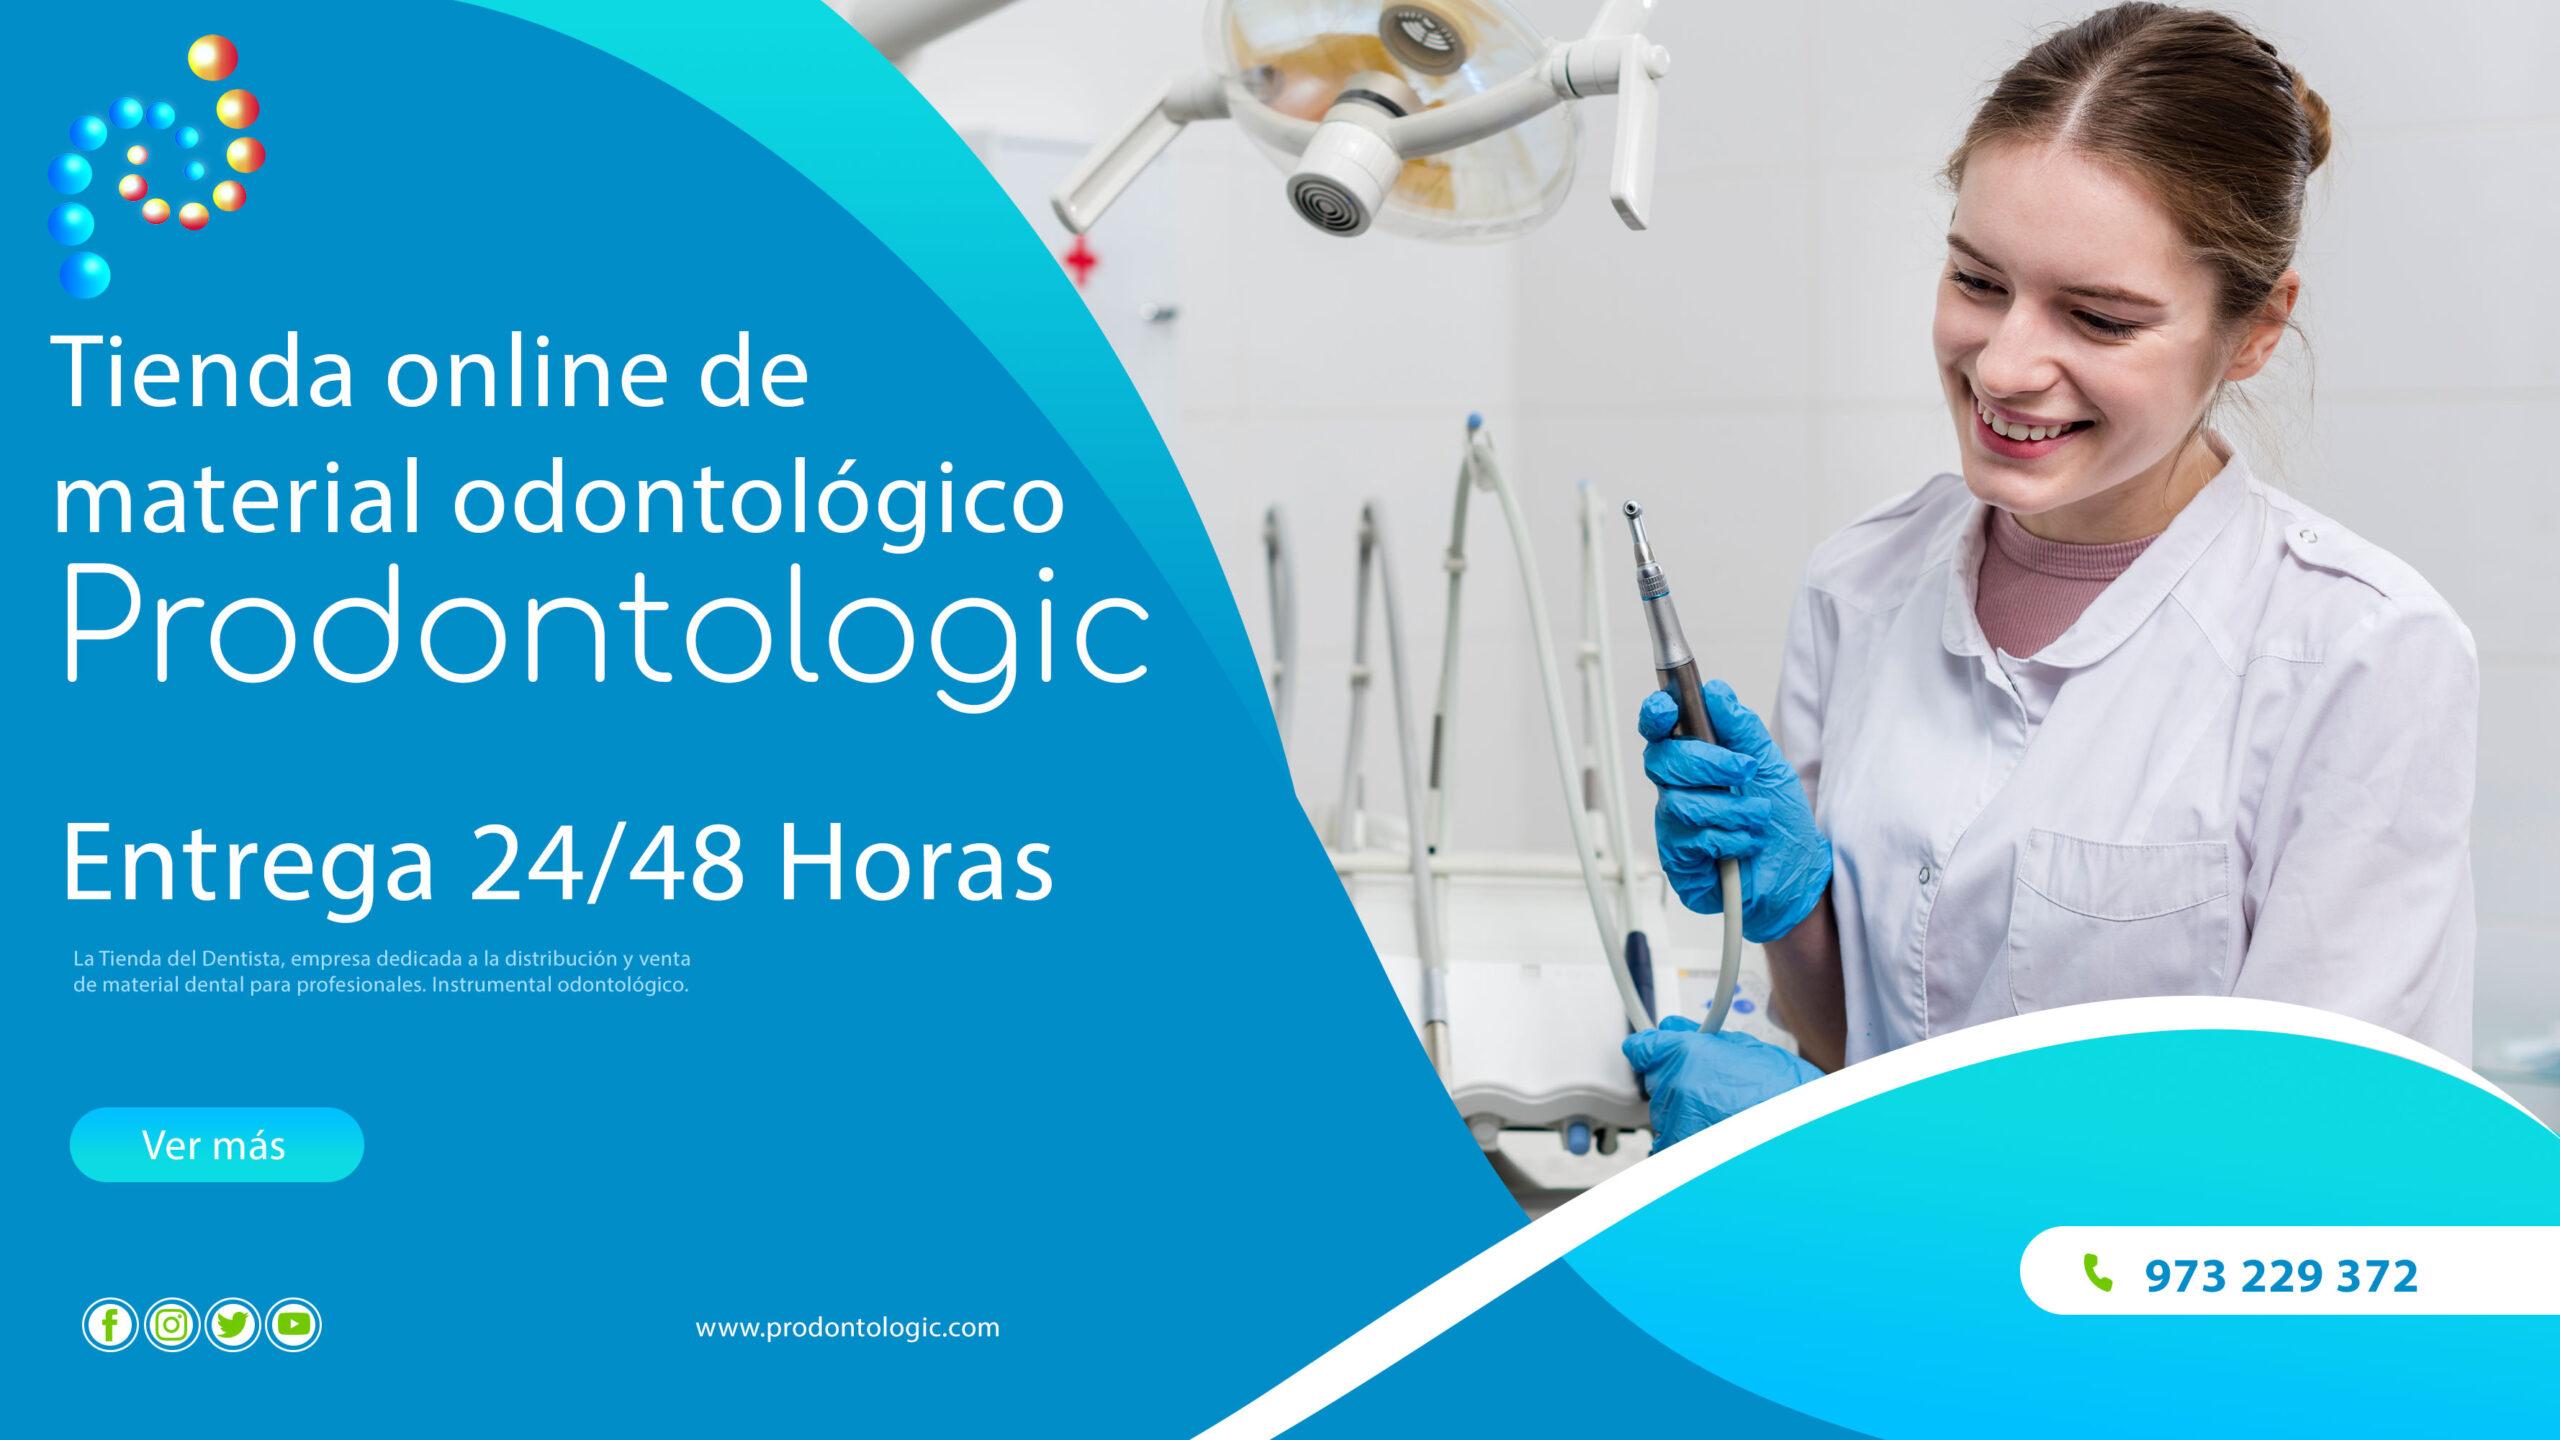 TIENDA DE MATERIAL ODONTOLOGIA